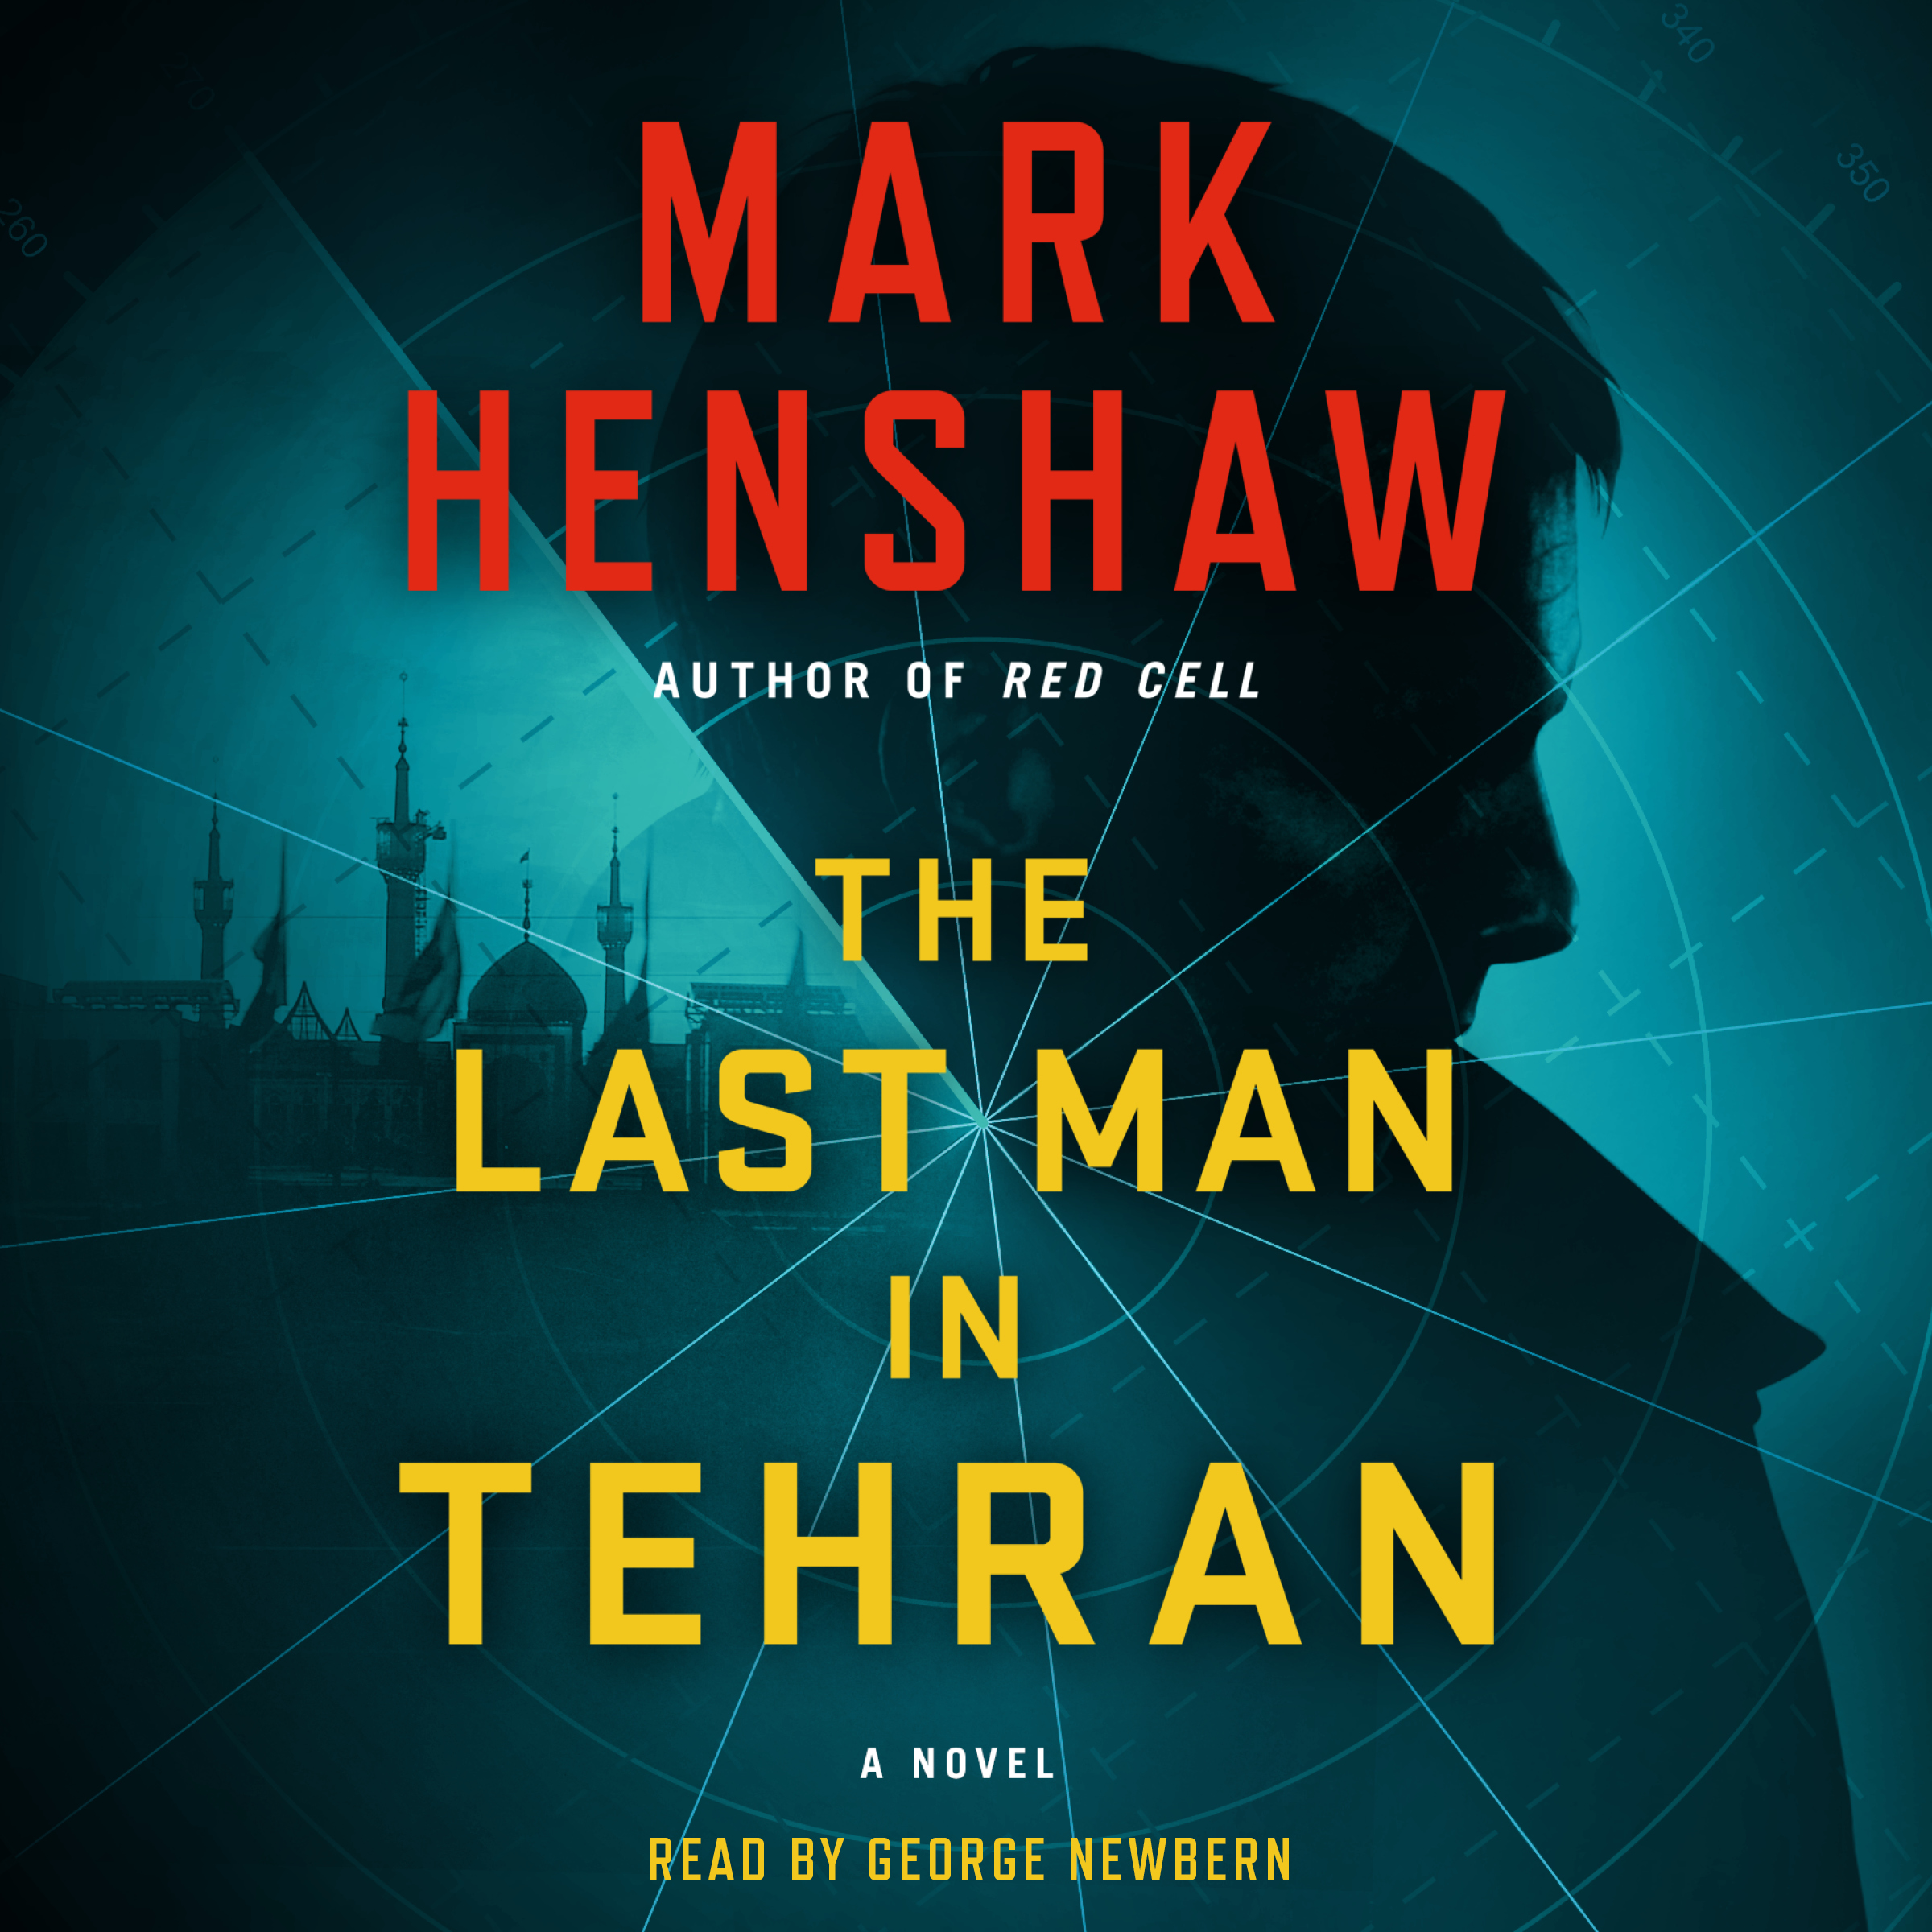 The last man in tehran 9781508252061 hr